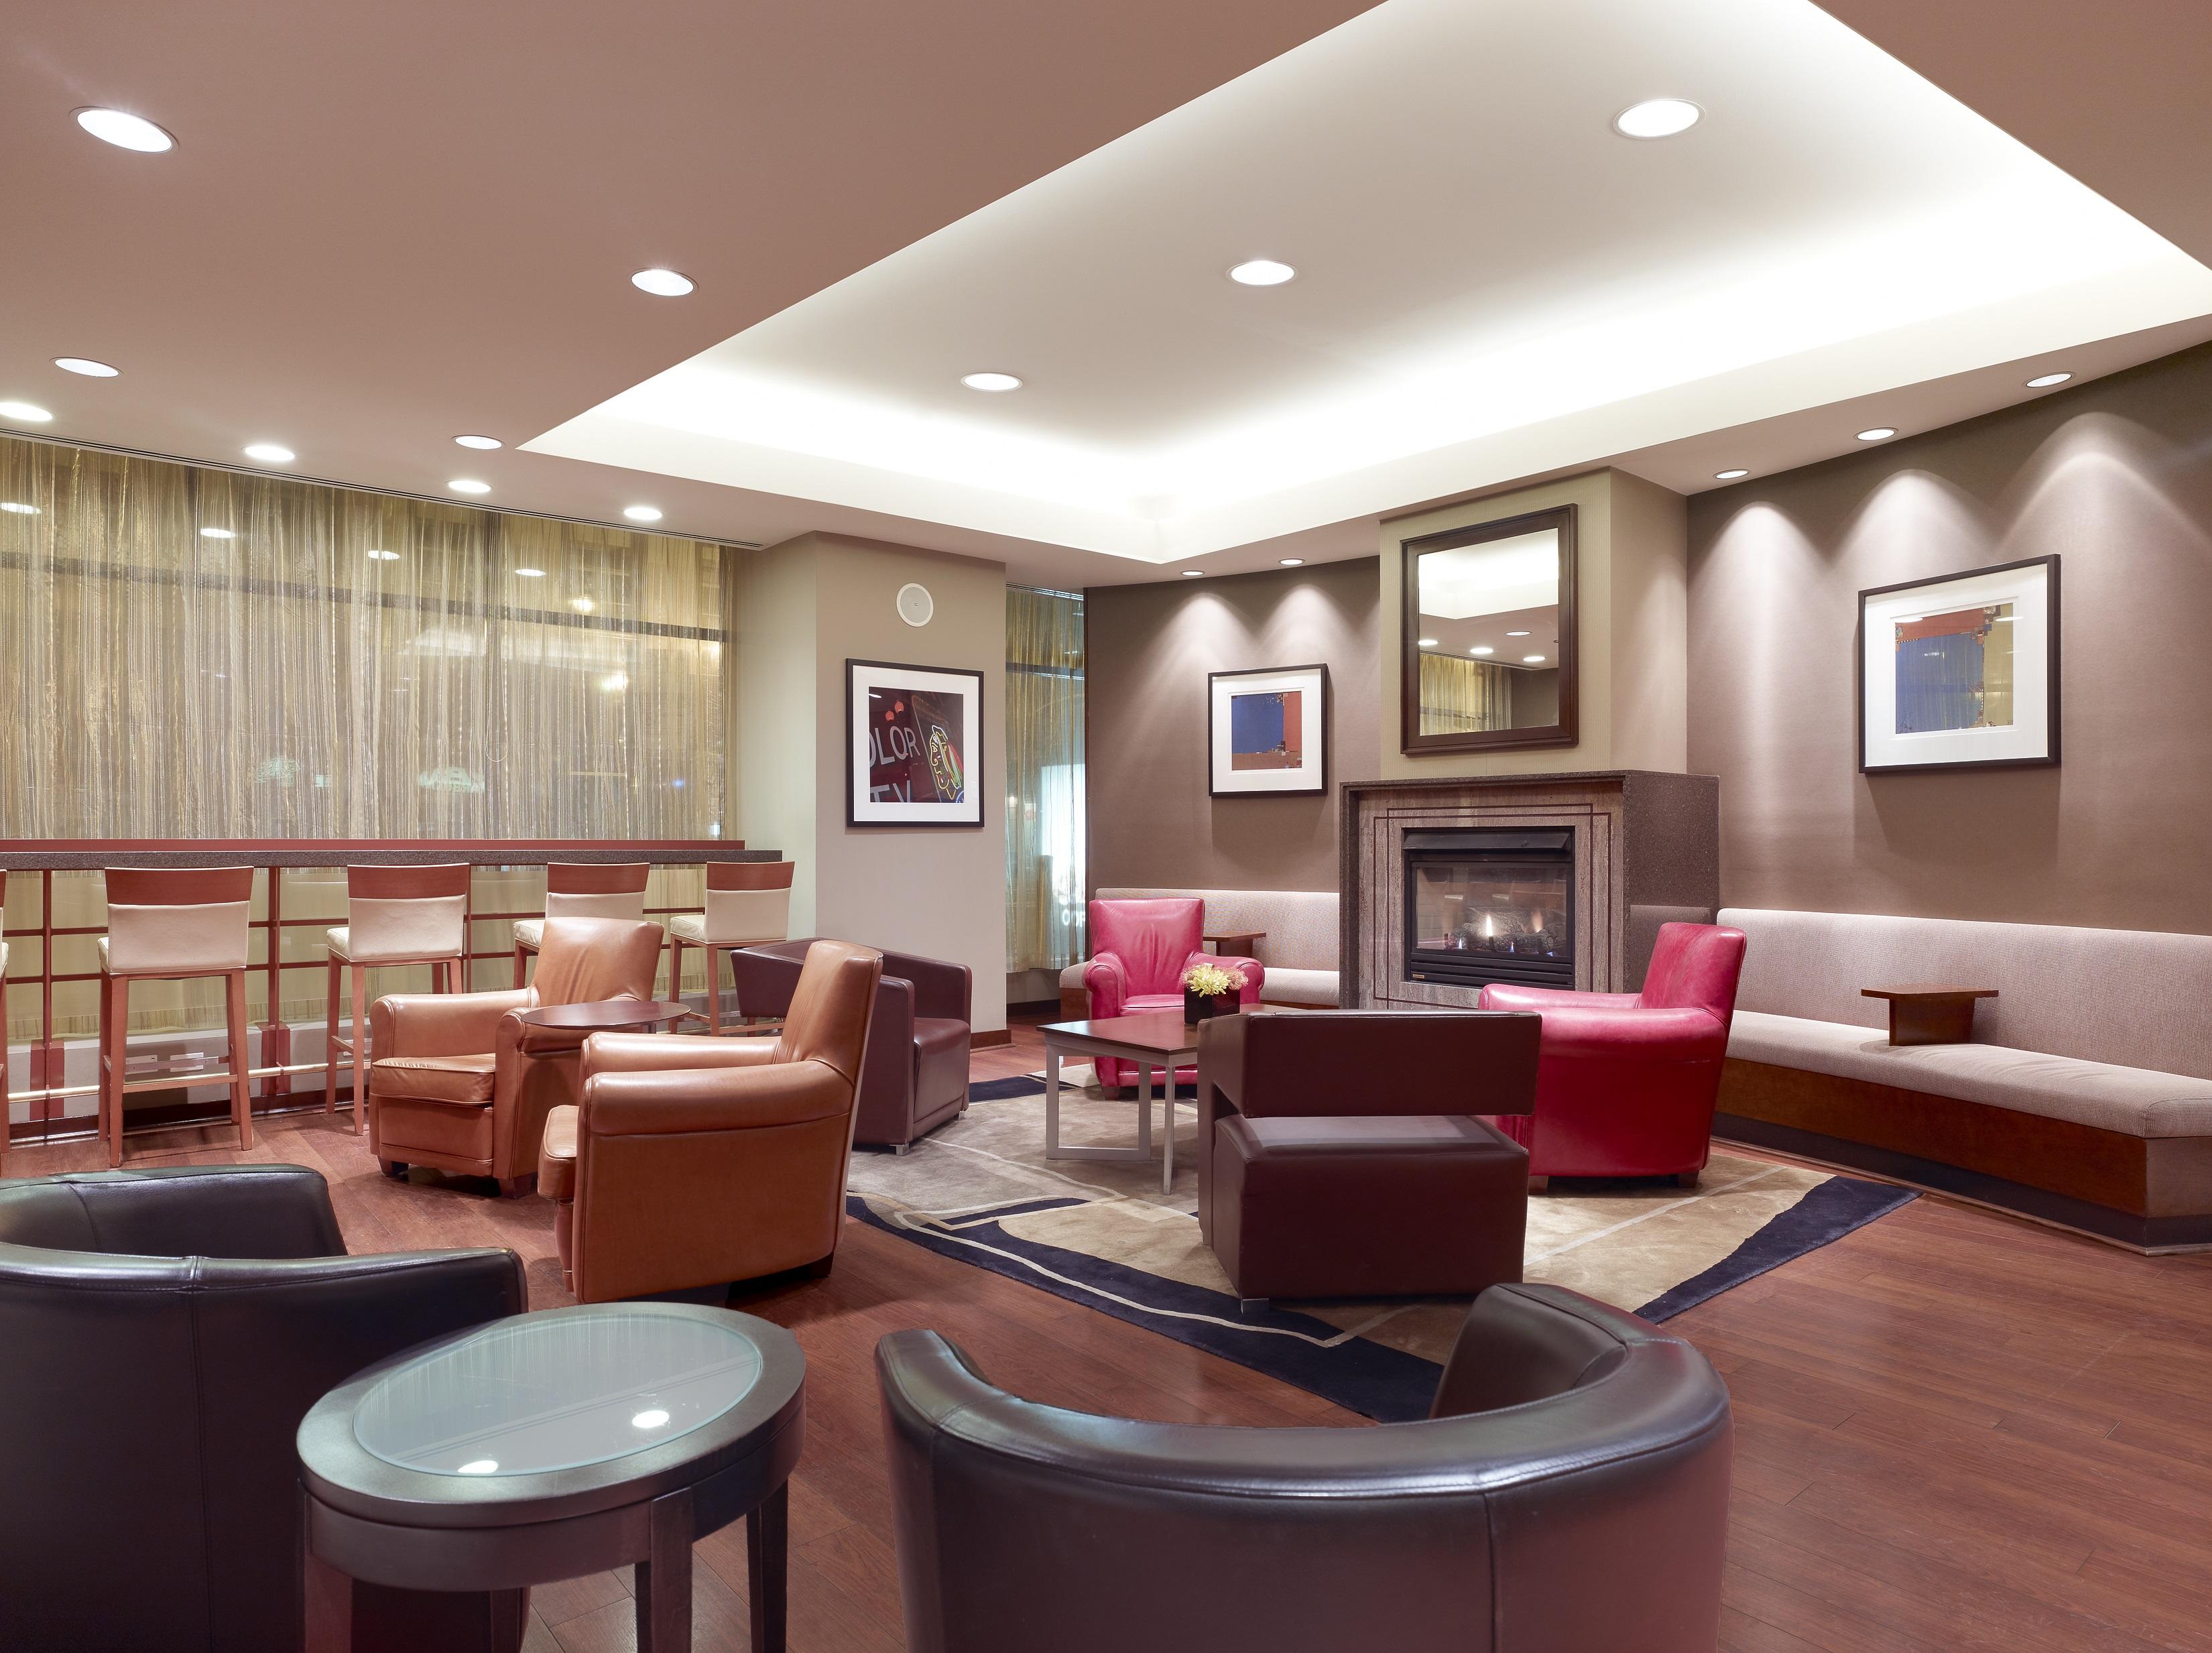 Lobby of Central Loop Hotel. Photo Courtesy of Lisa Piccirillo